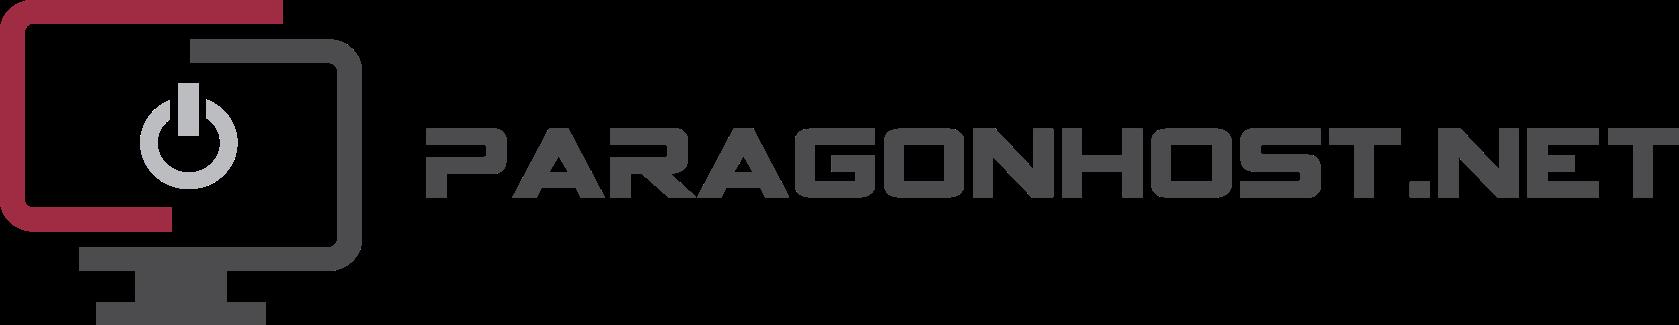 ParagonHost.net